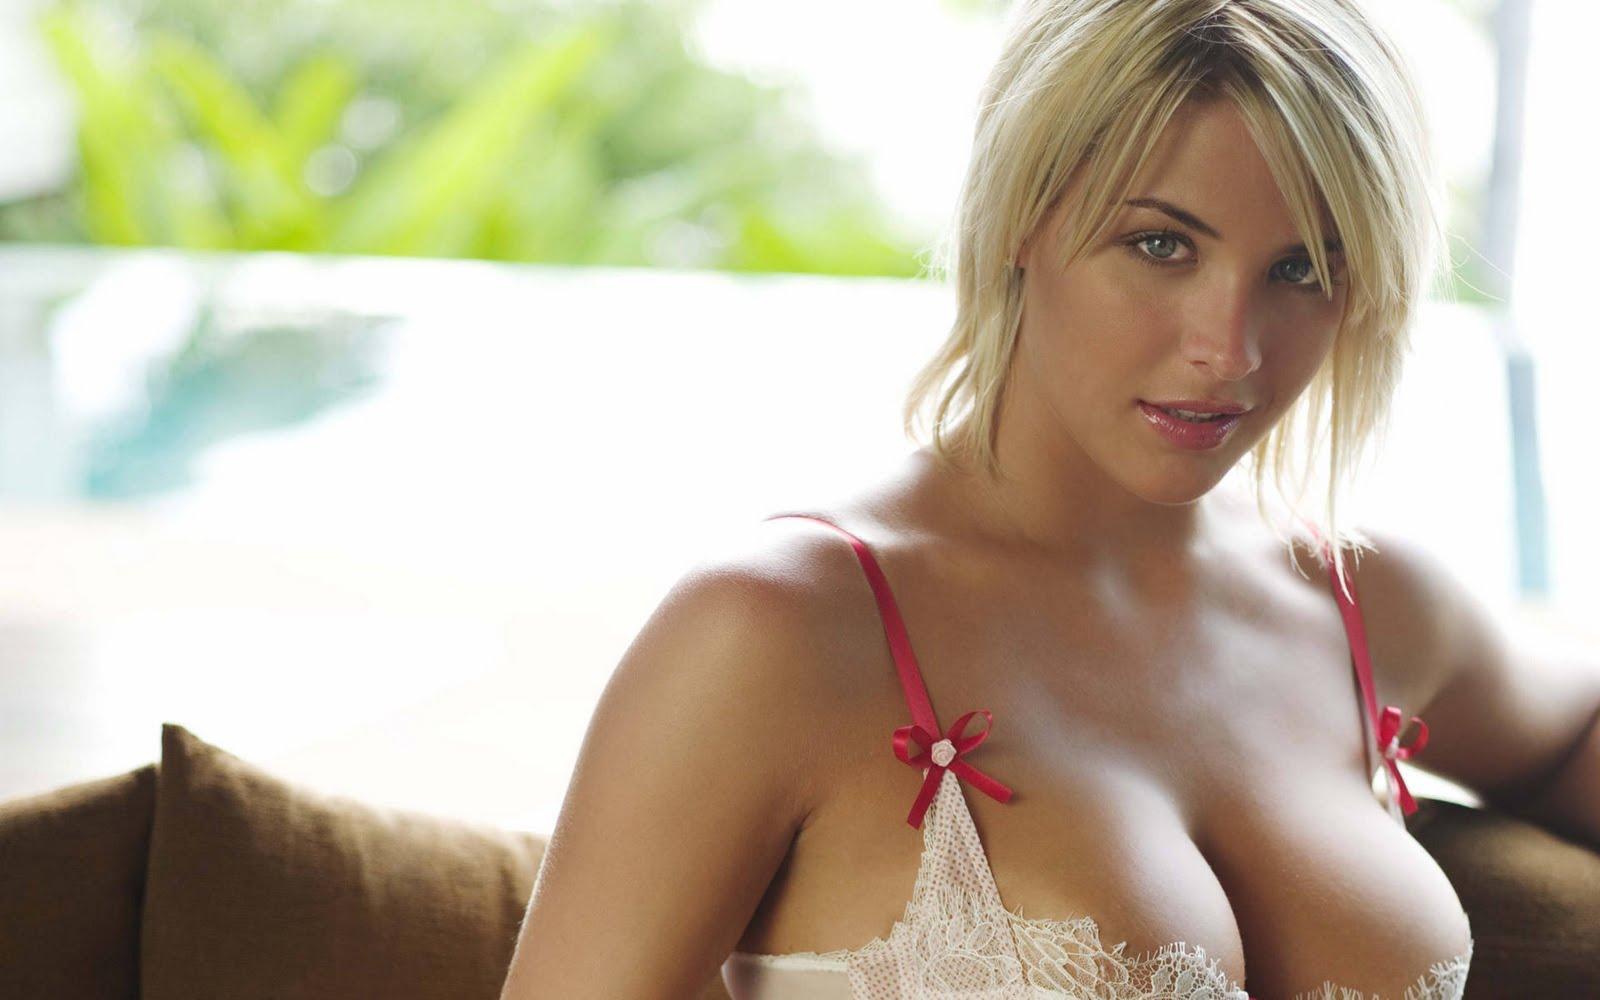 hot women in movies